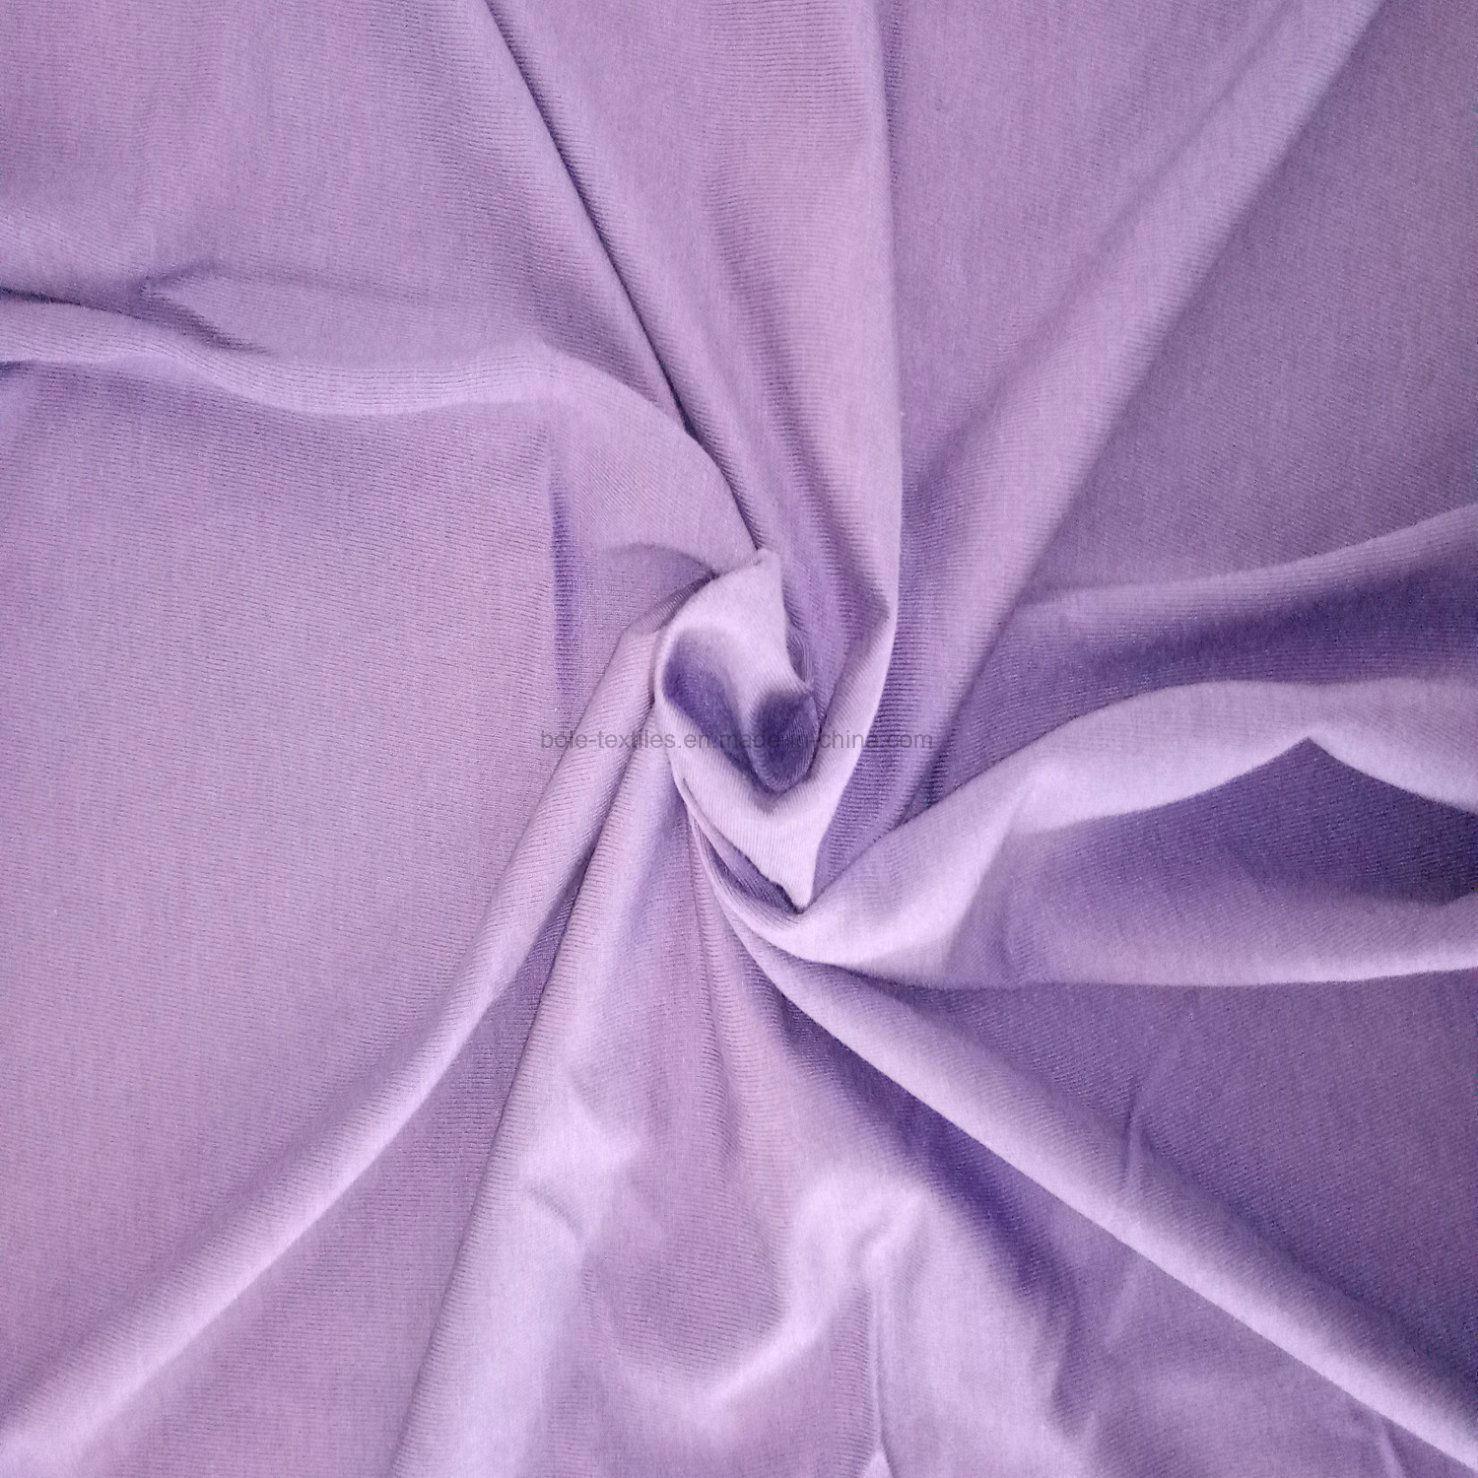 Bamboo Fiber Elastic Fabric/Bamboo Fiber Cloth